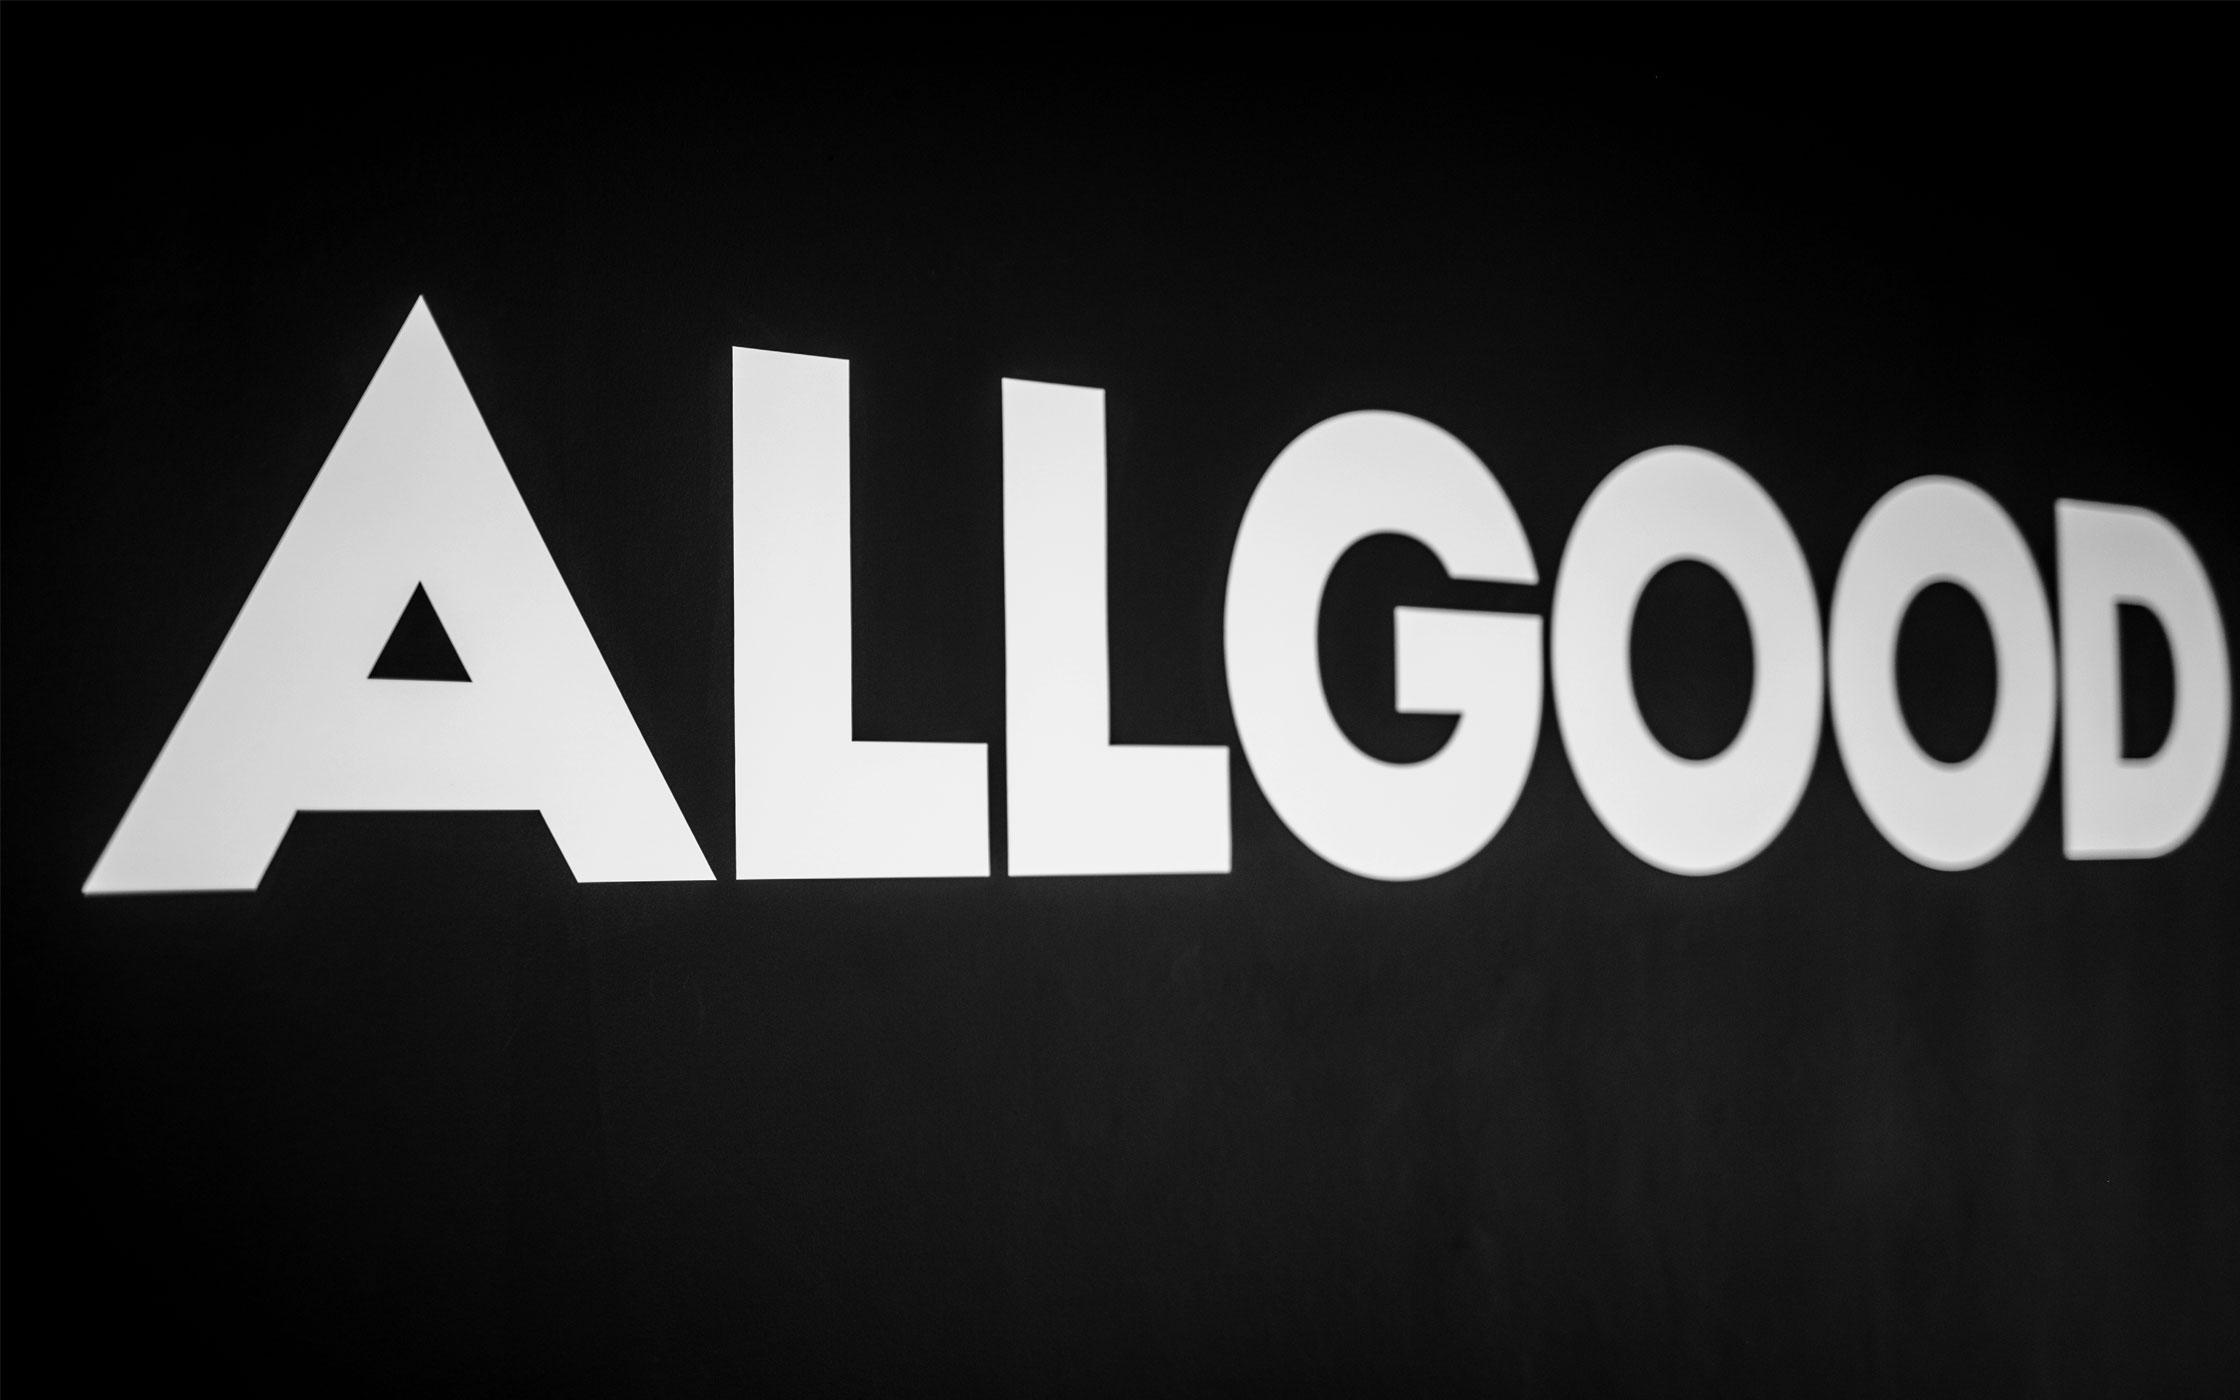 ALLGOOD has rebranded